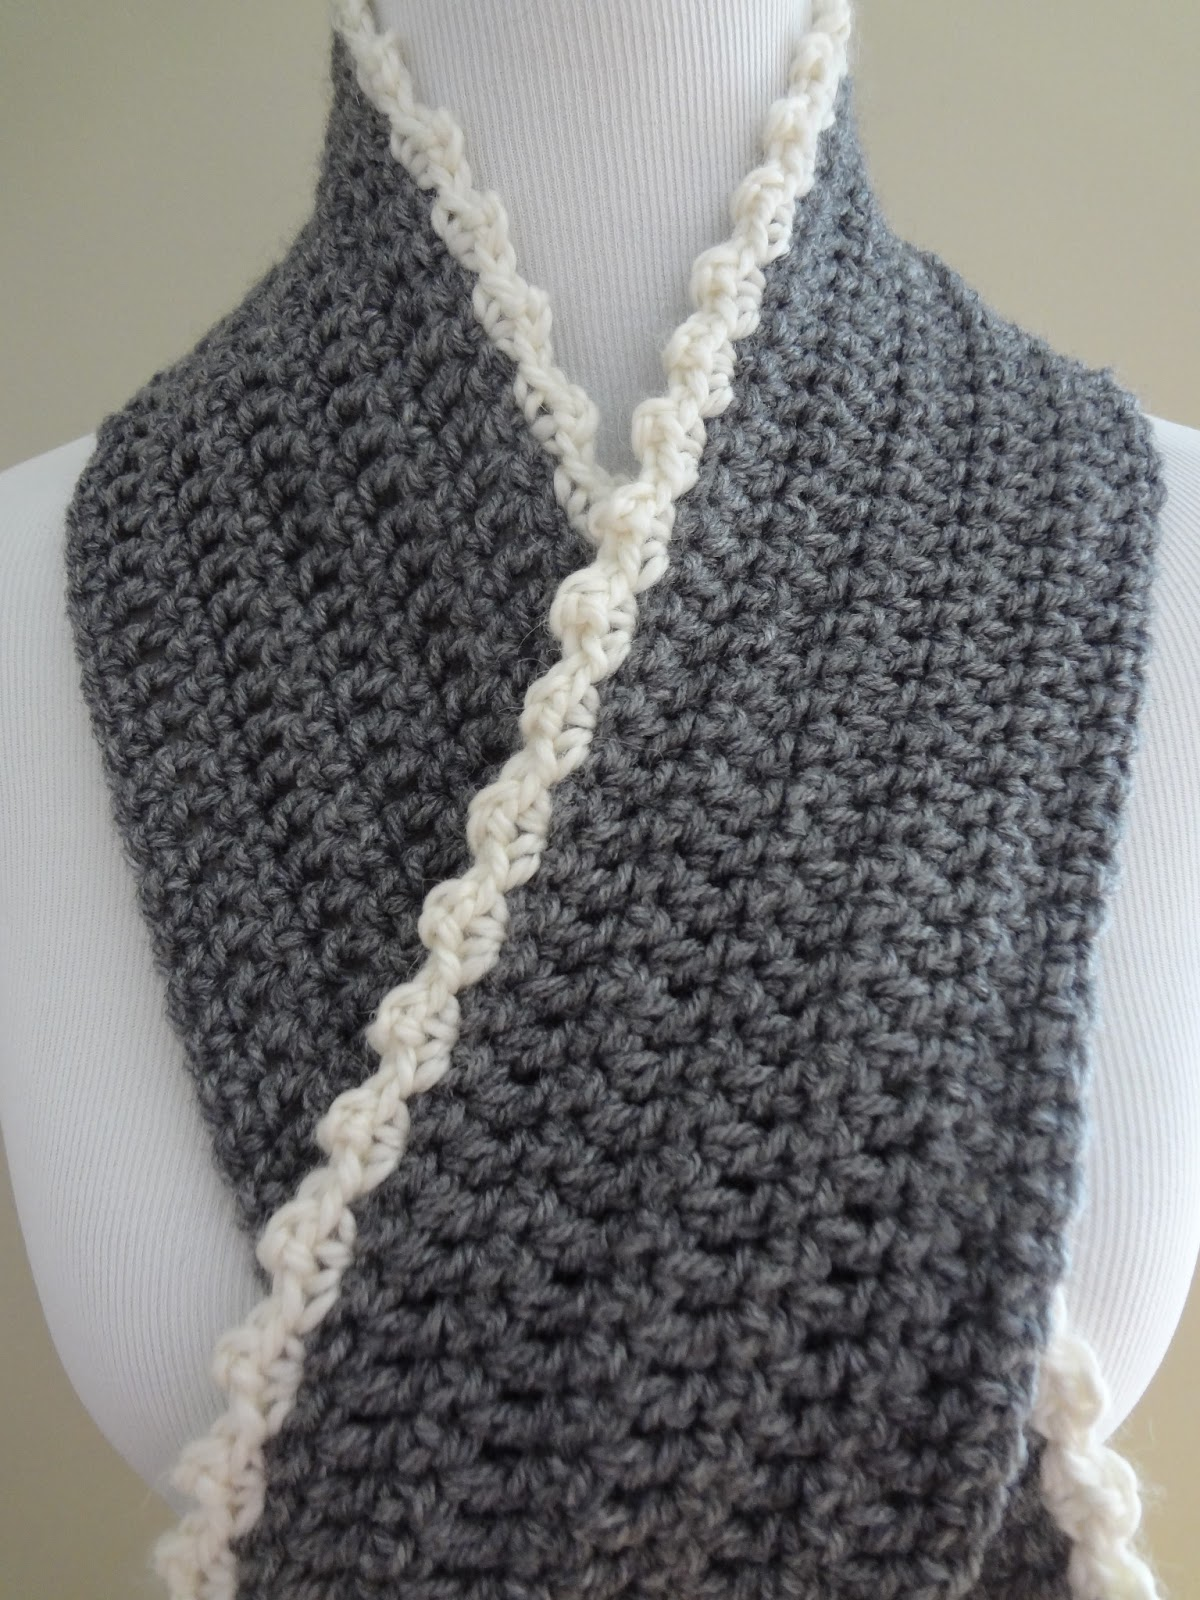 crochet scarf free crochet pattern...ingrid scarf axzshgv